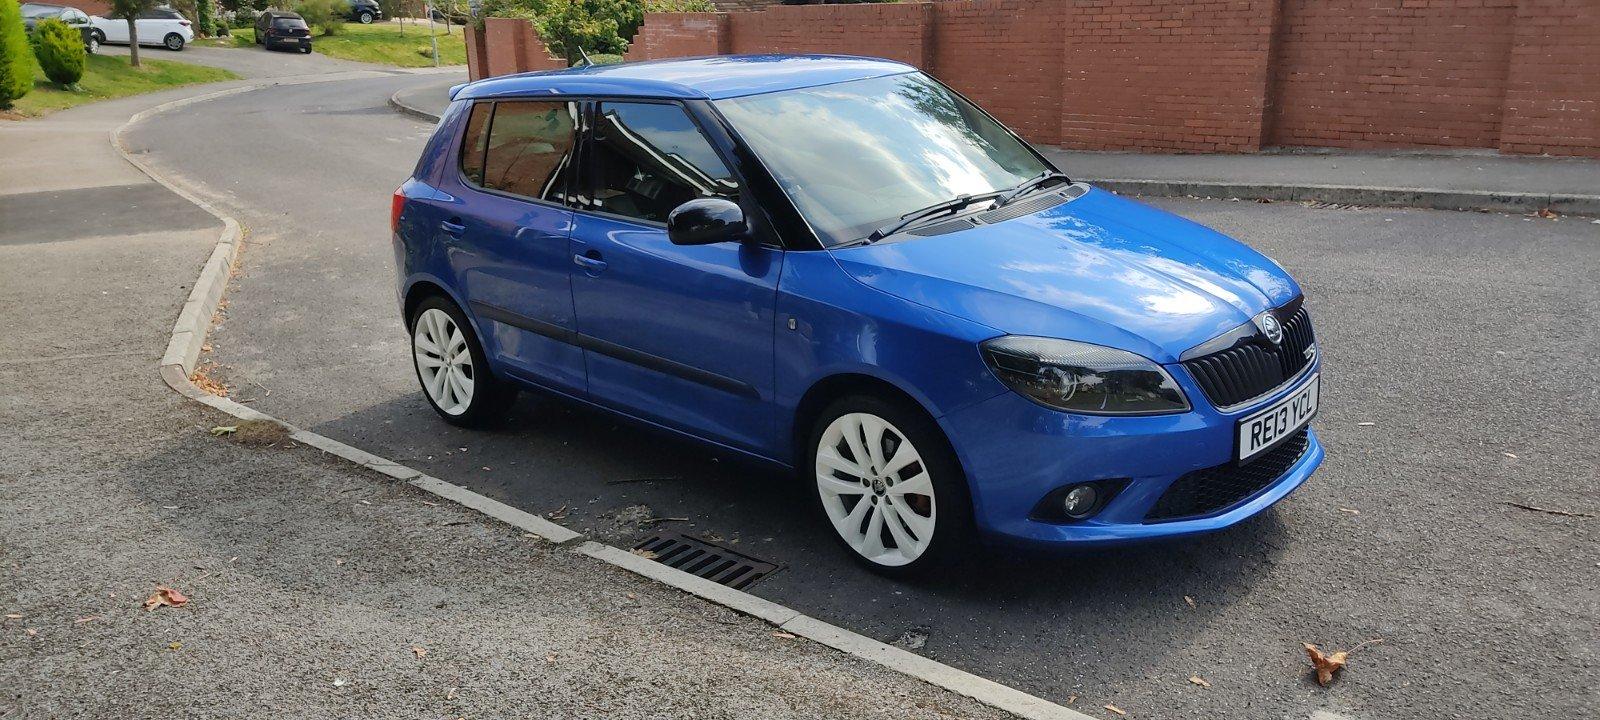 2013 Skoda Fabia VRS Hatch, FSH, 57k miles, Blue For Sale (picture 5 of 6)